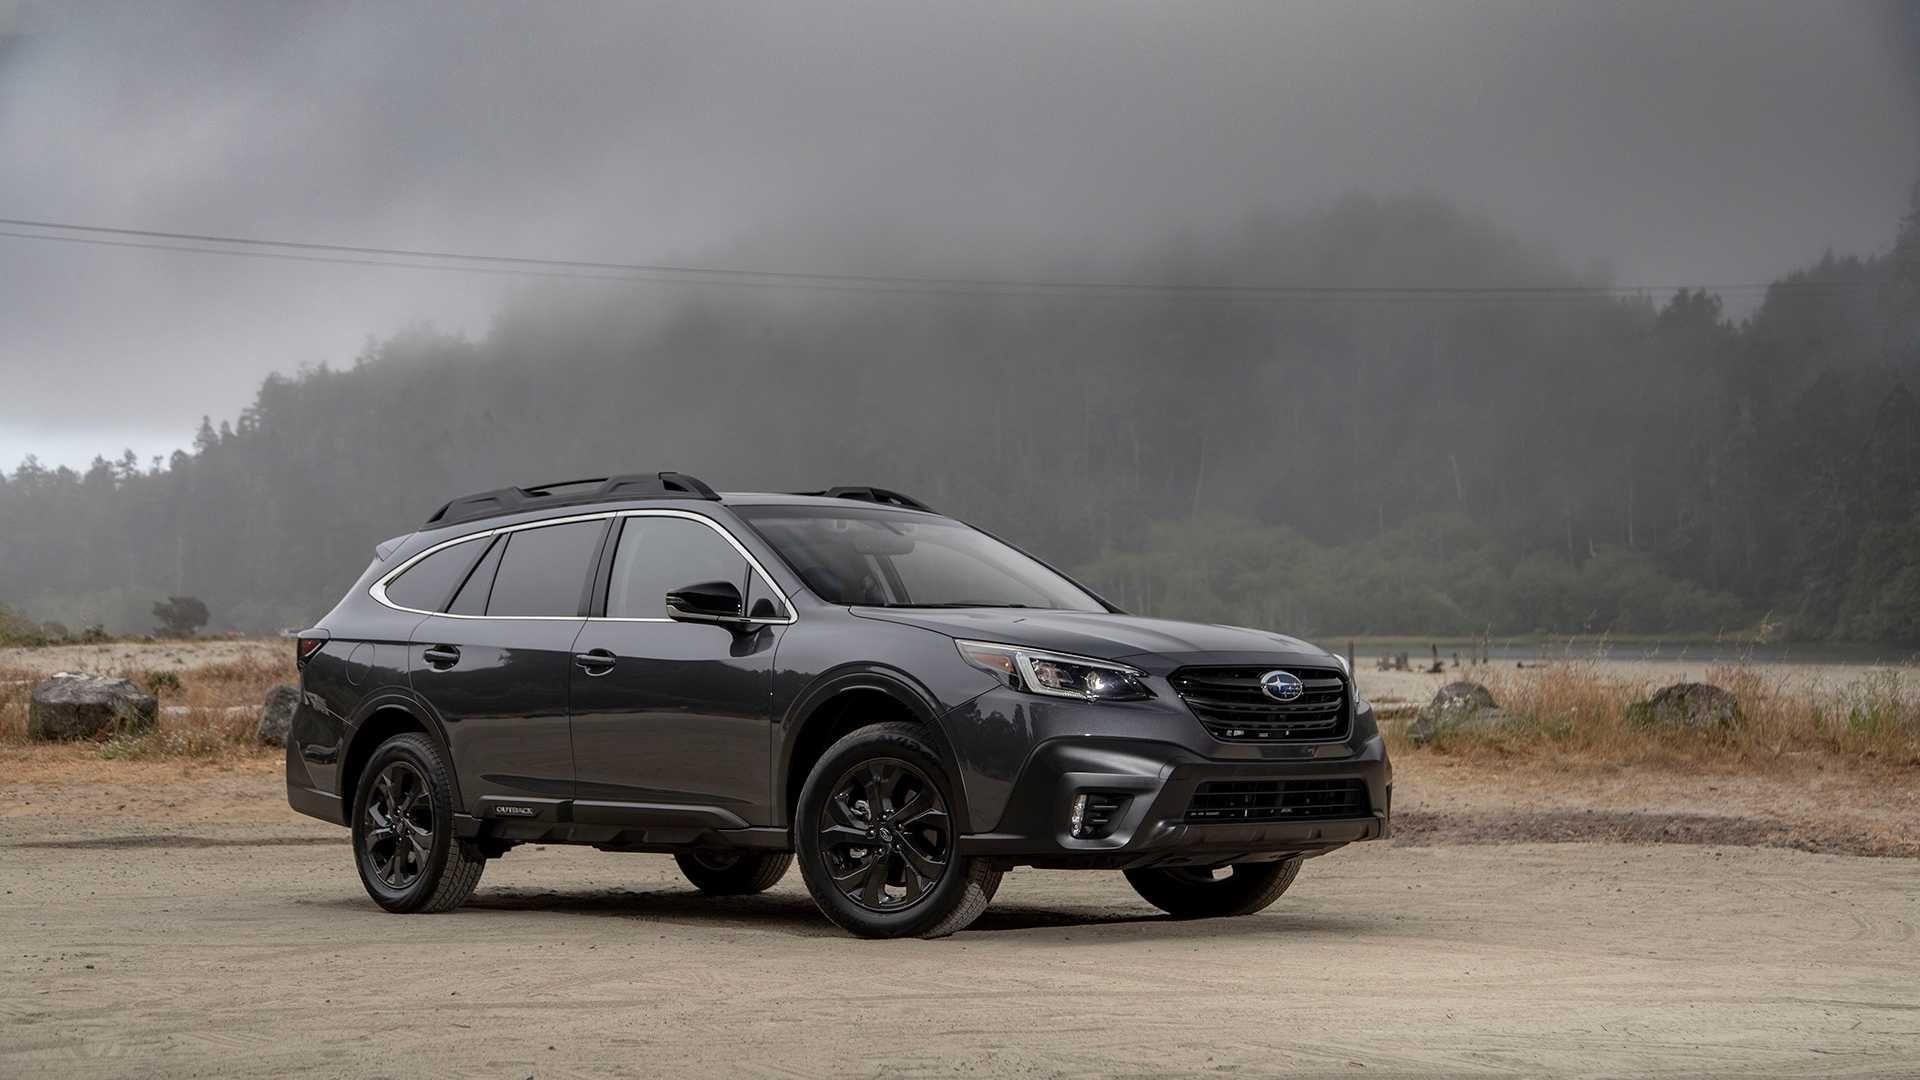 2020 Subaru Outback Xt Onyx Edition Review Rock Solid In 2020 Subaru Outback Subaru Cars Subaru